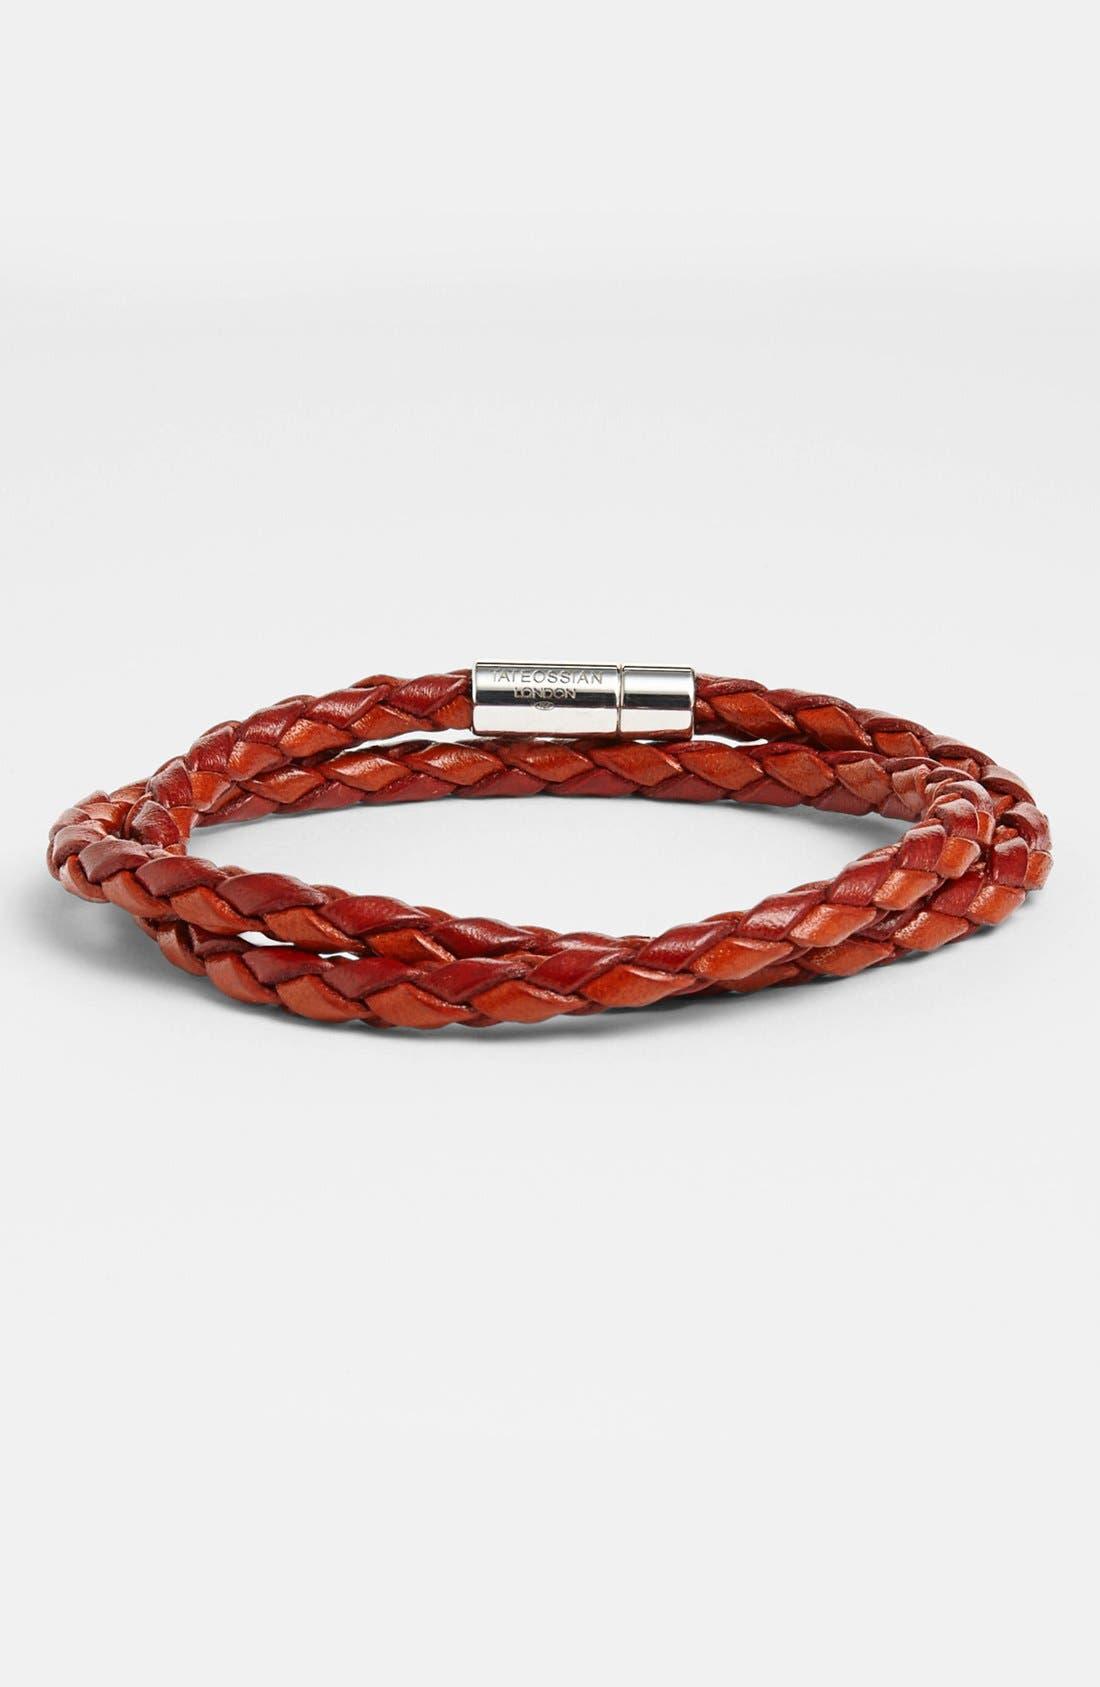 Alternate Image 1 Selected - Tateossian 'Pop' Leather Bracelet